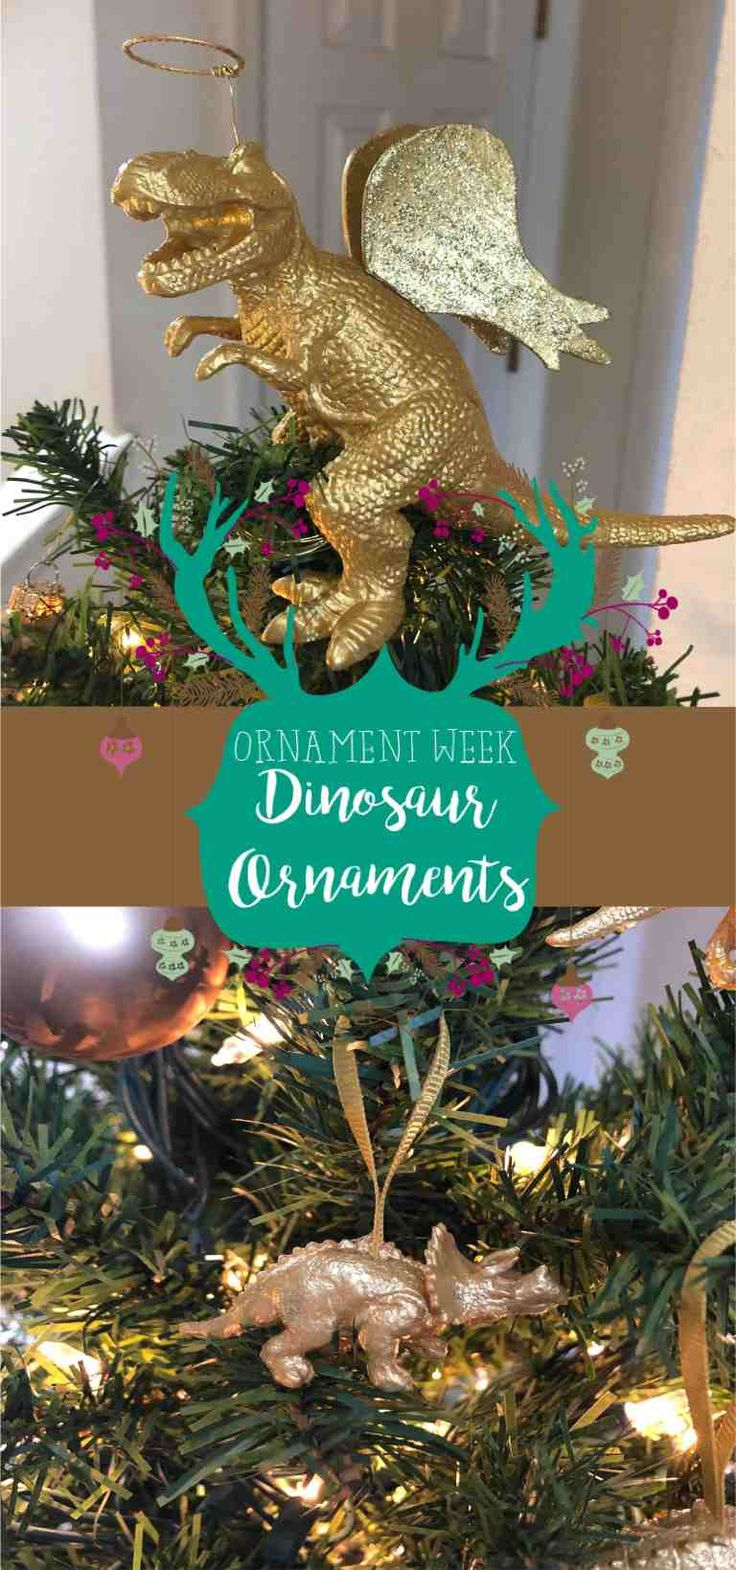 Ornament Week DIY Dinosaur Ornaments in 2020 Dinosaur